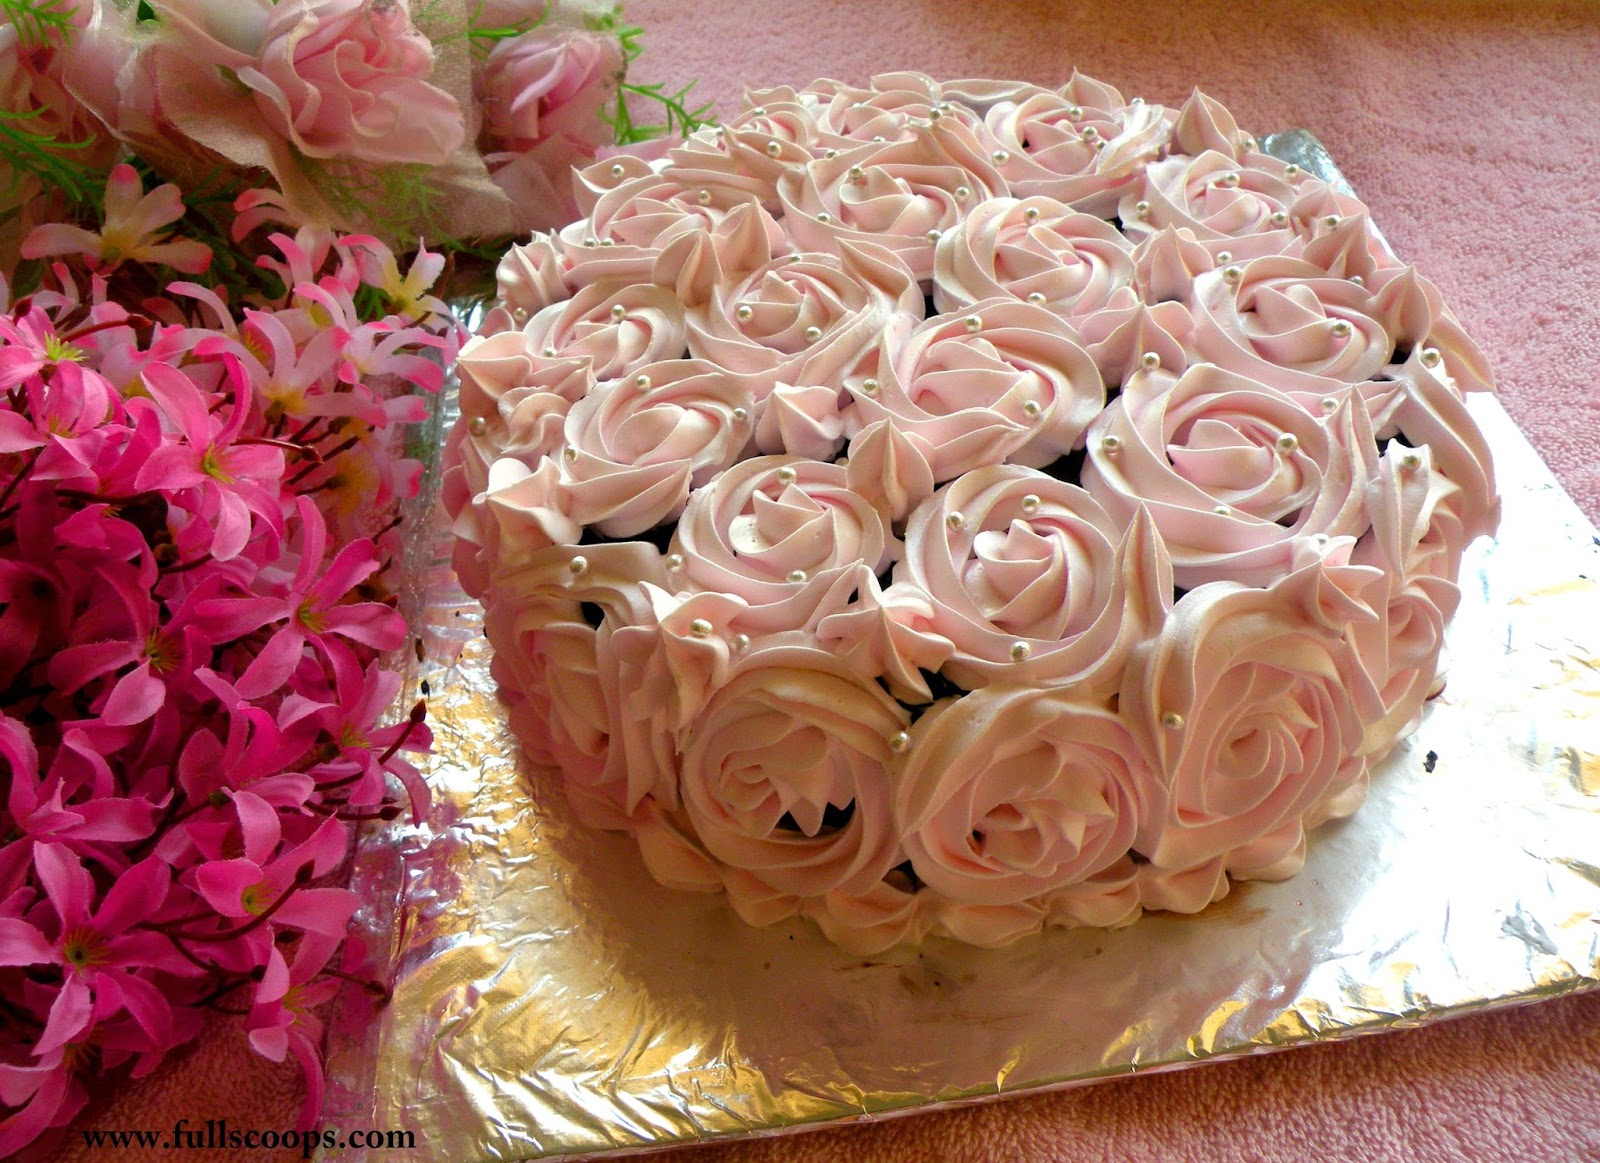 Best Ever Chocolate Cake Recipe Full Scoops